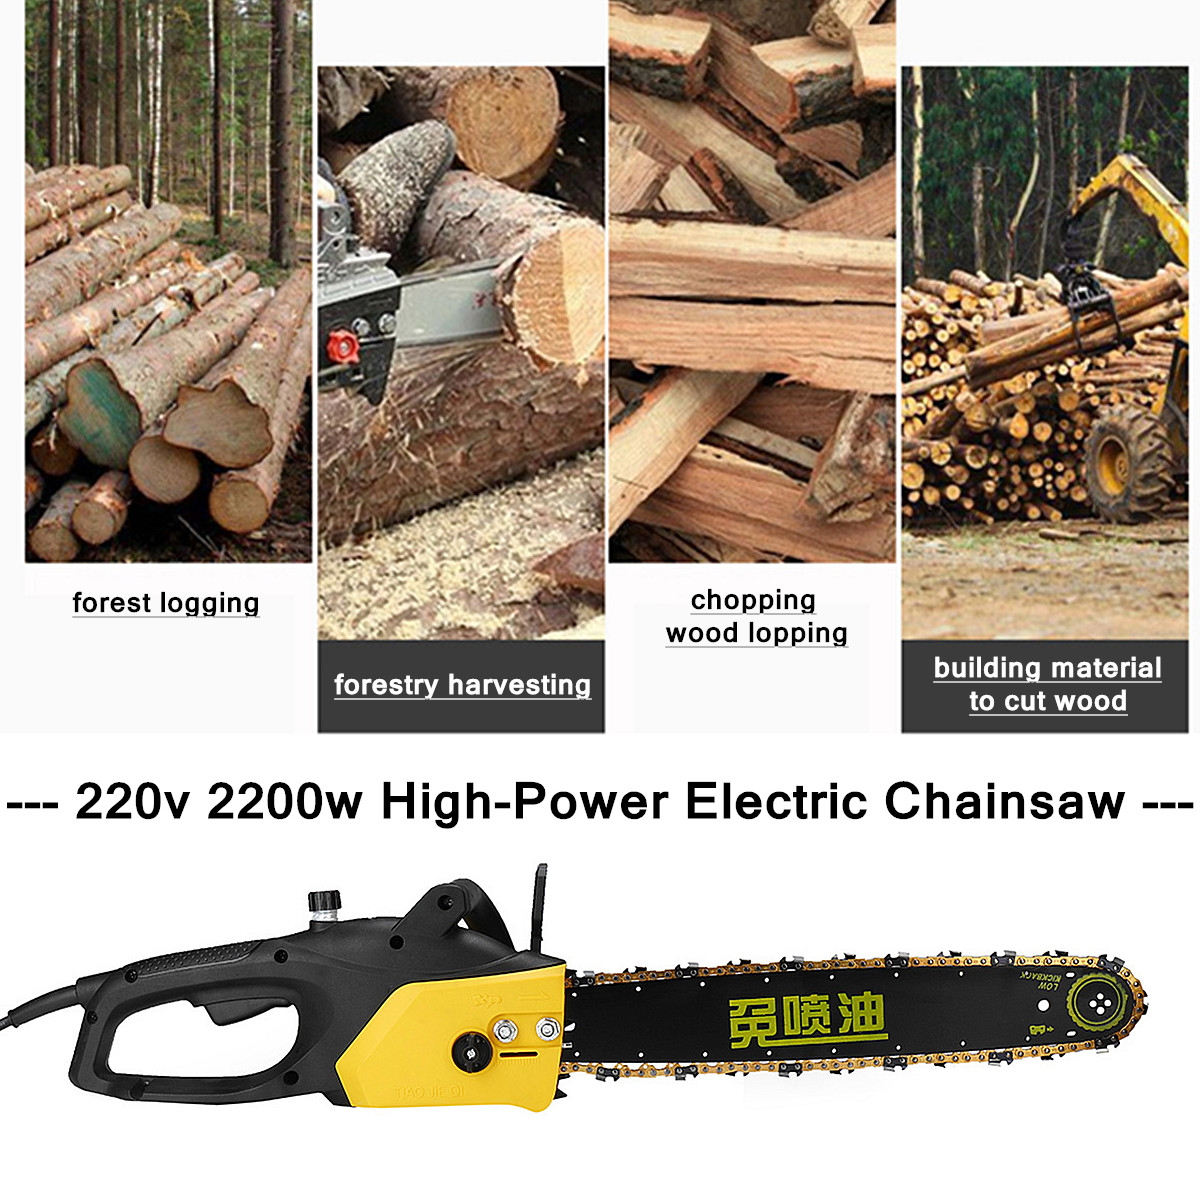 2200W 50Hz 220V 600r/min Portable Heavy Duty Electric Chainsaw Logging Garden Cutting Saw Tool Efficient Cut Guide Plat 405mm bt151 bt151 600r to 220